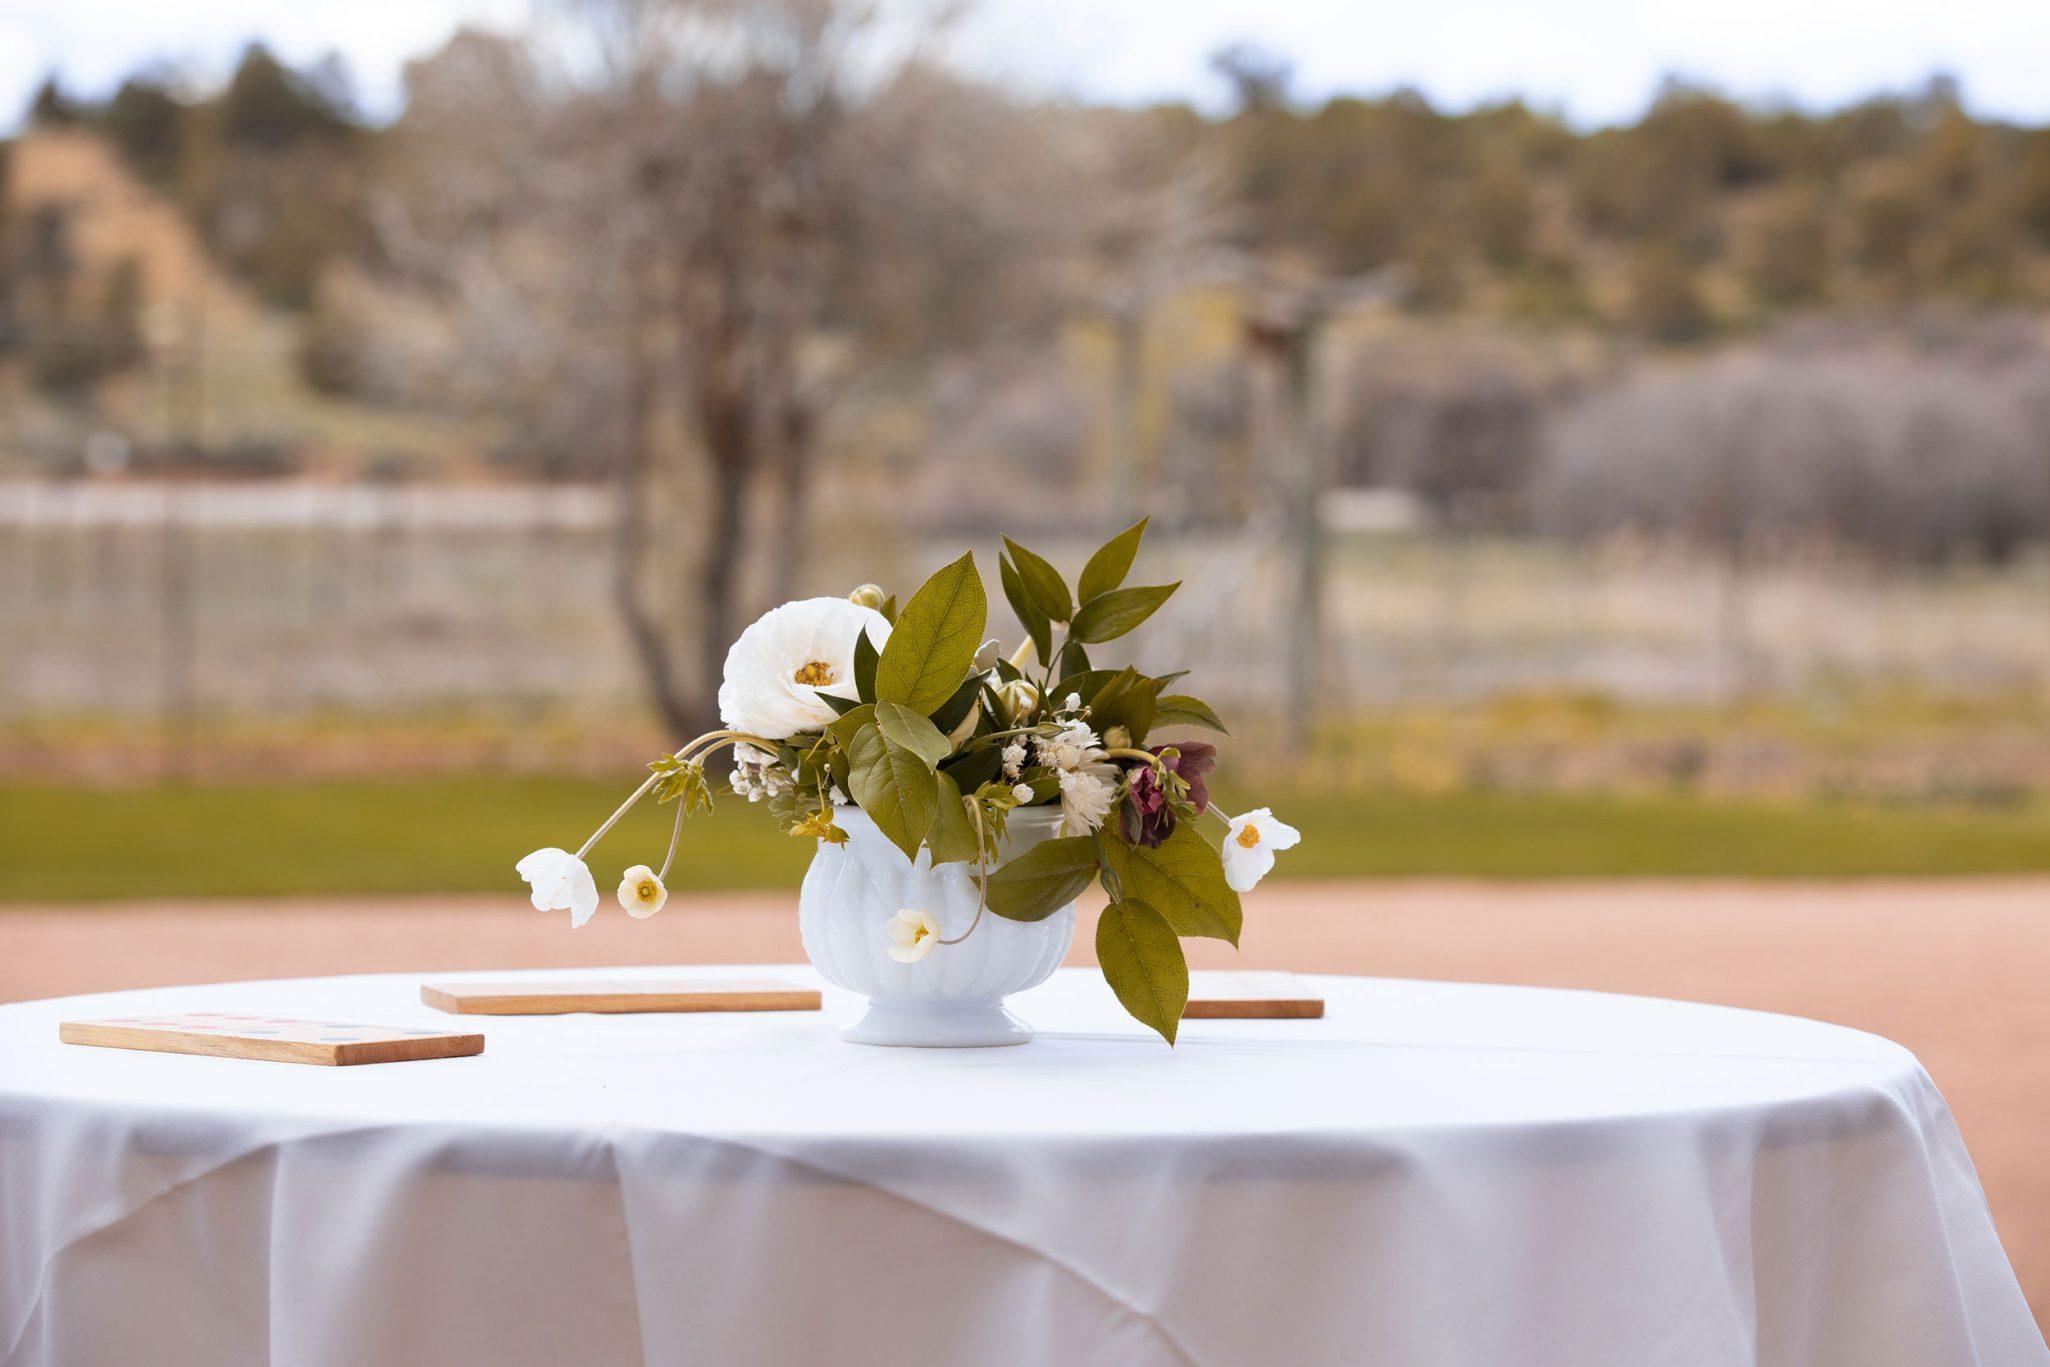 Cocktail table floral centerpiece